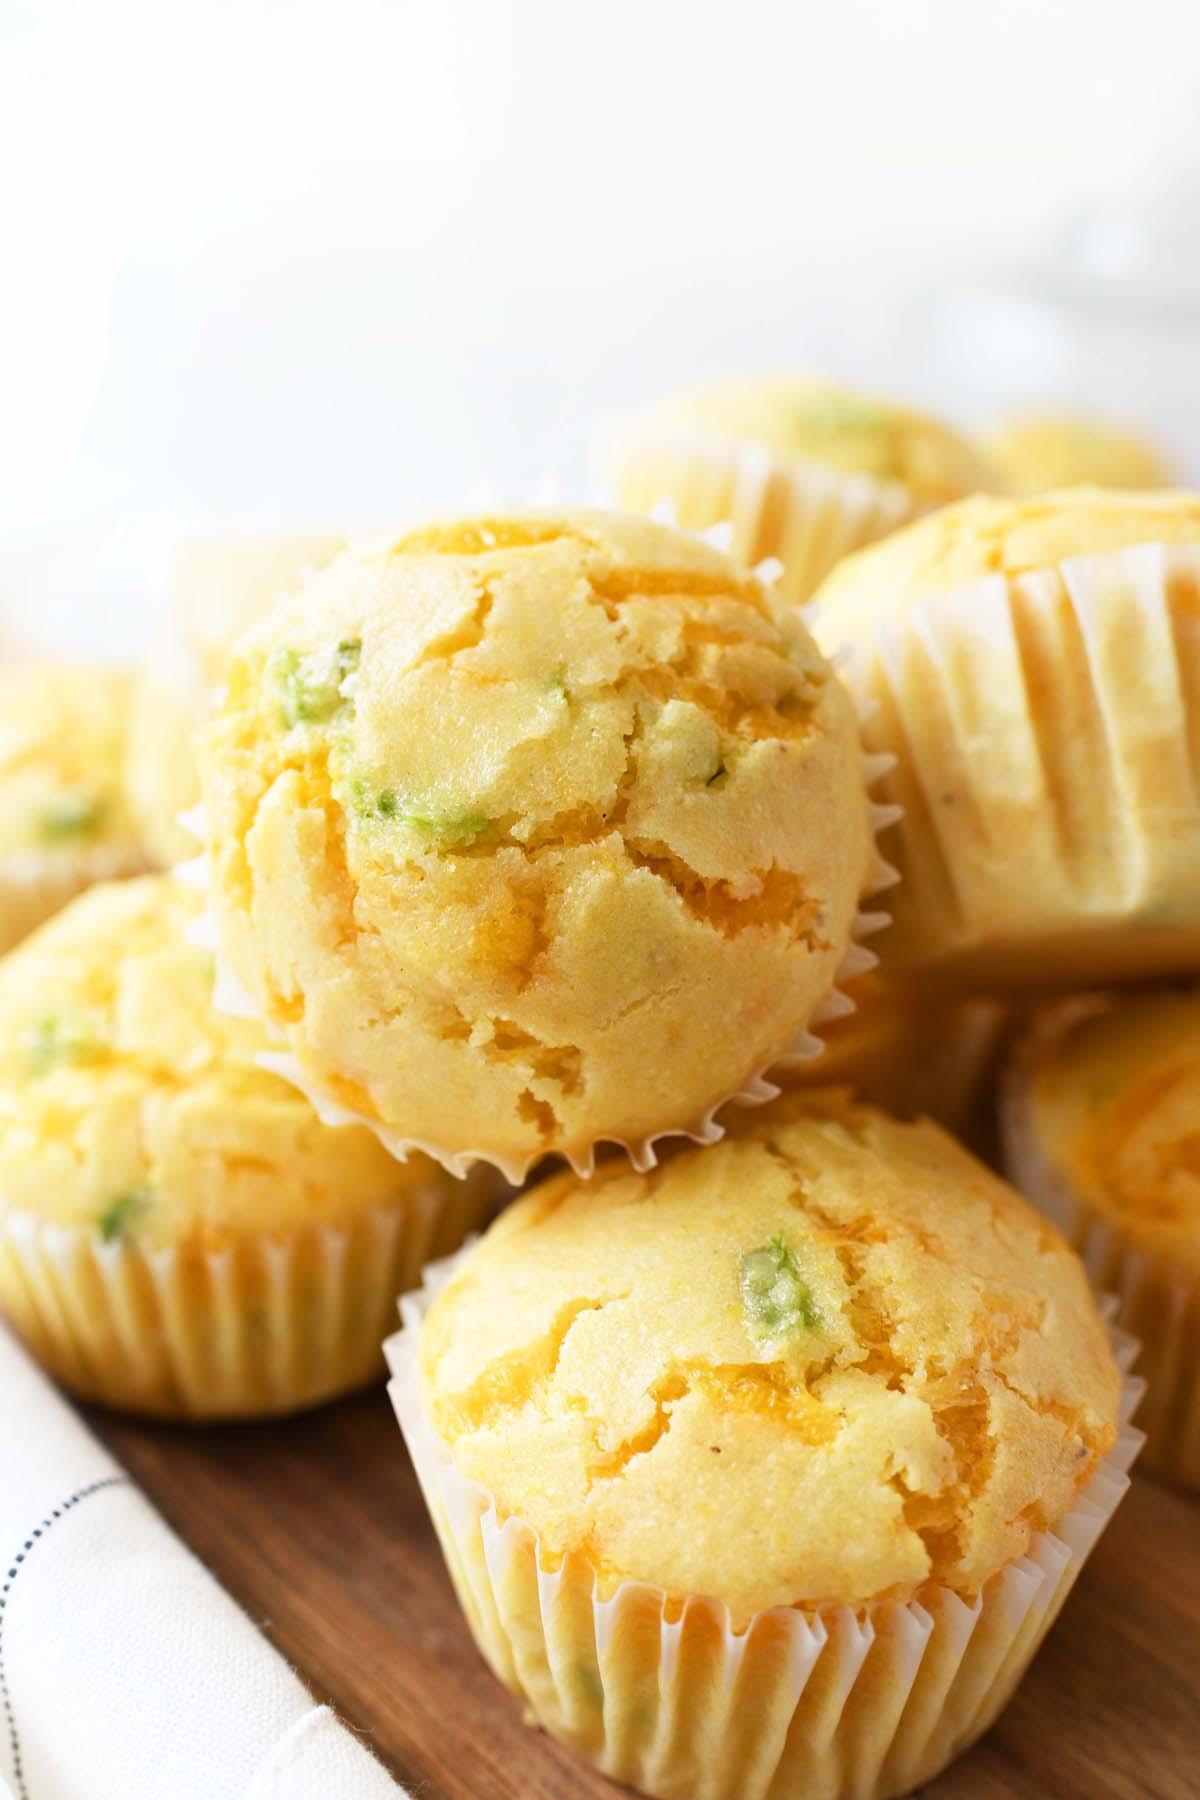 A close up shot of a moist jalapeno cheddar corn muffin.